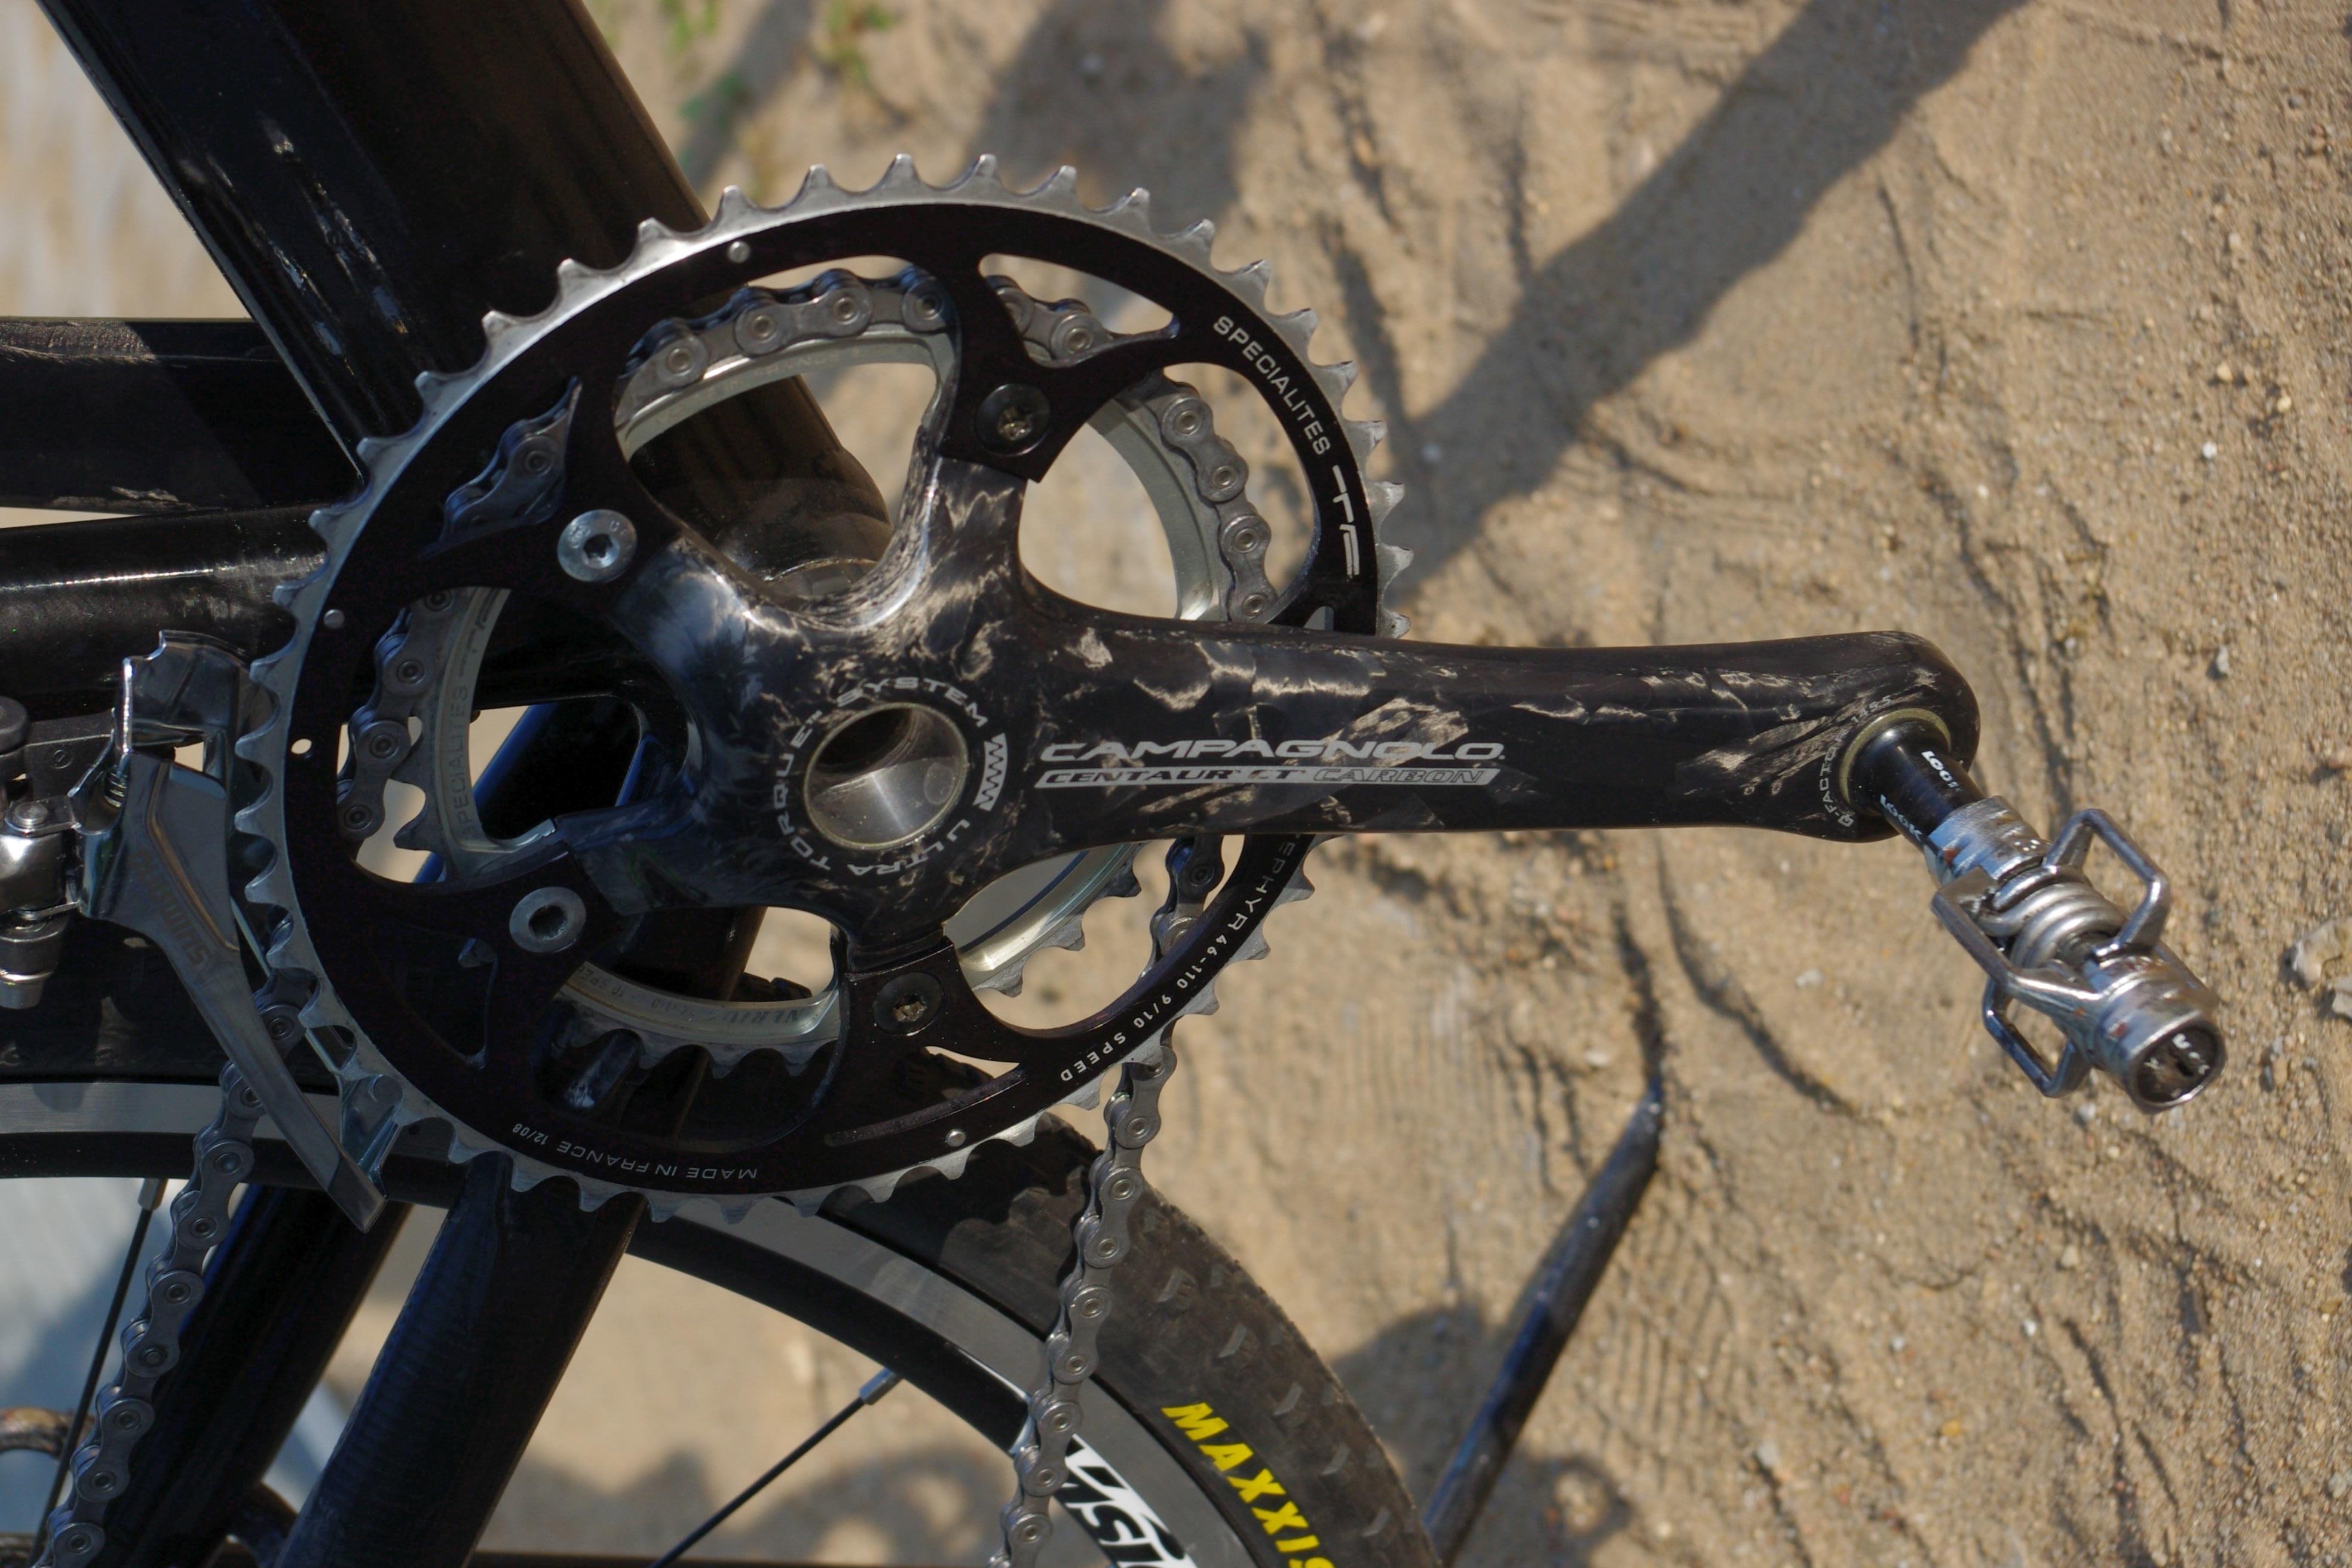 Free Images Wheel Sports Equipment Mountain Bike Freeride